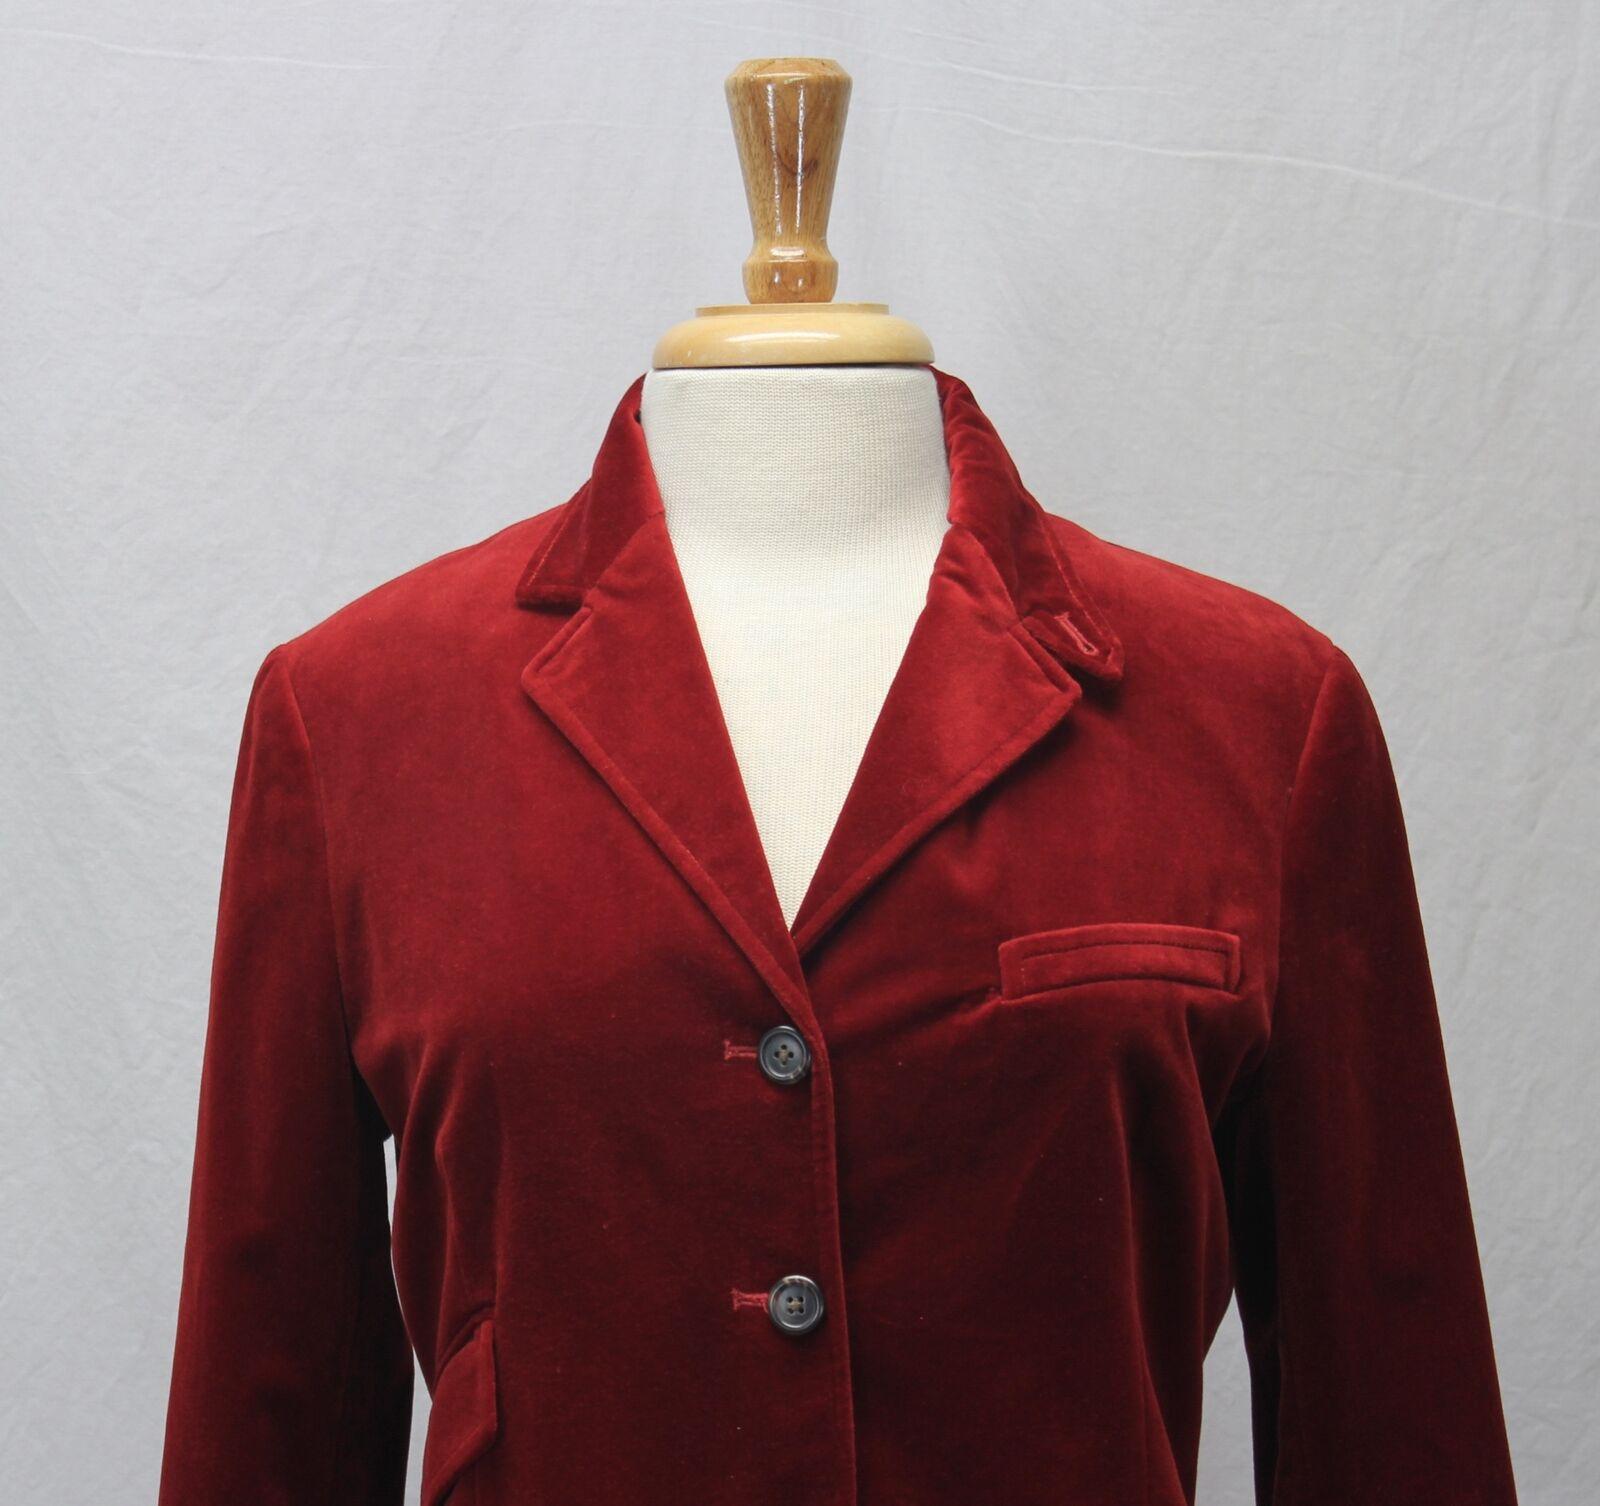 Ralph Lauren Red Velvet Blazer Jacket Size 10 - image 2